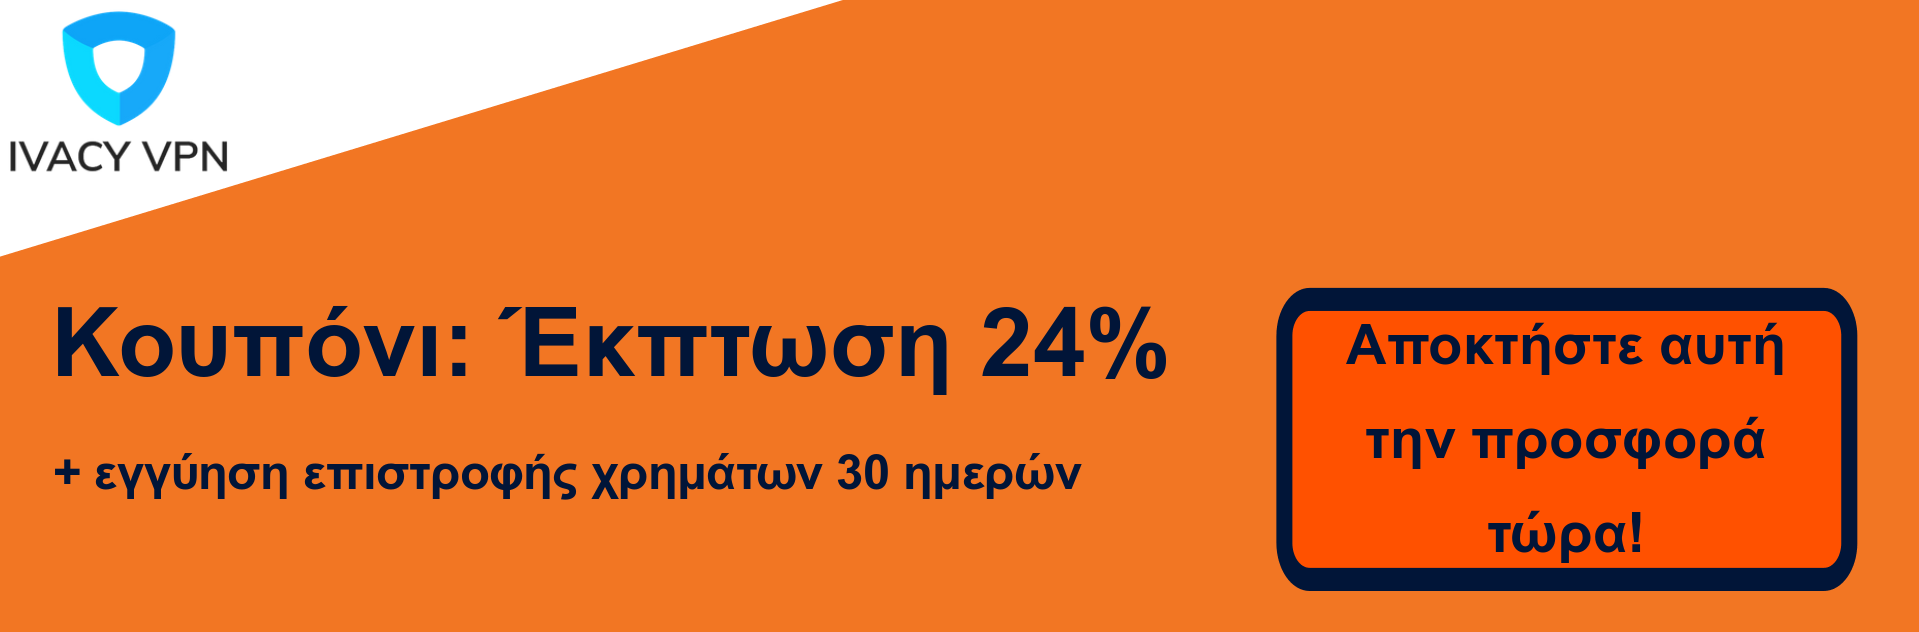 Ivacy VPN κουπόνι banner - έκπτωση 24%